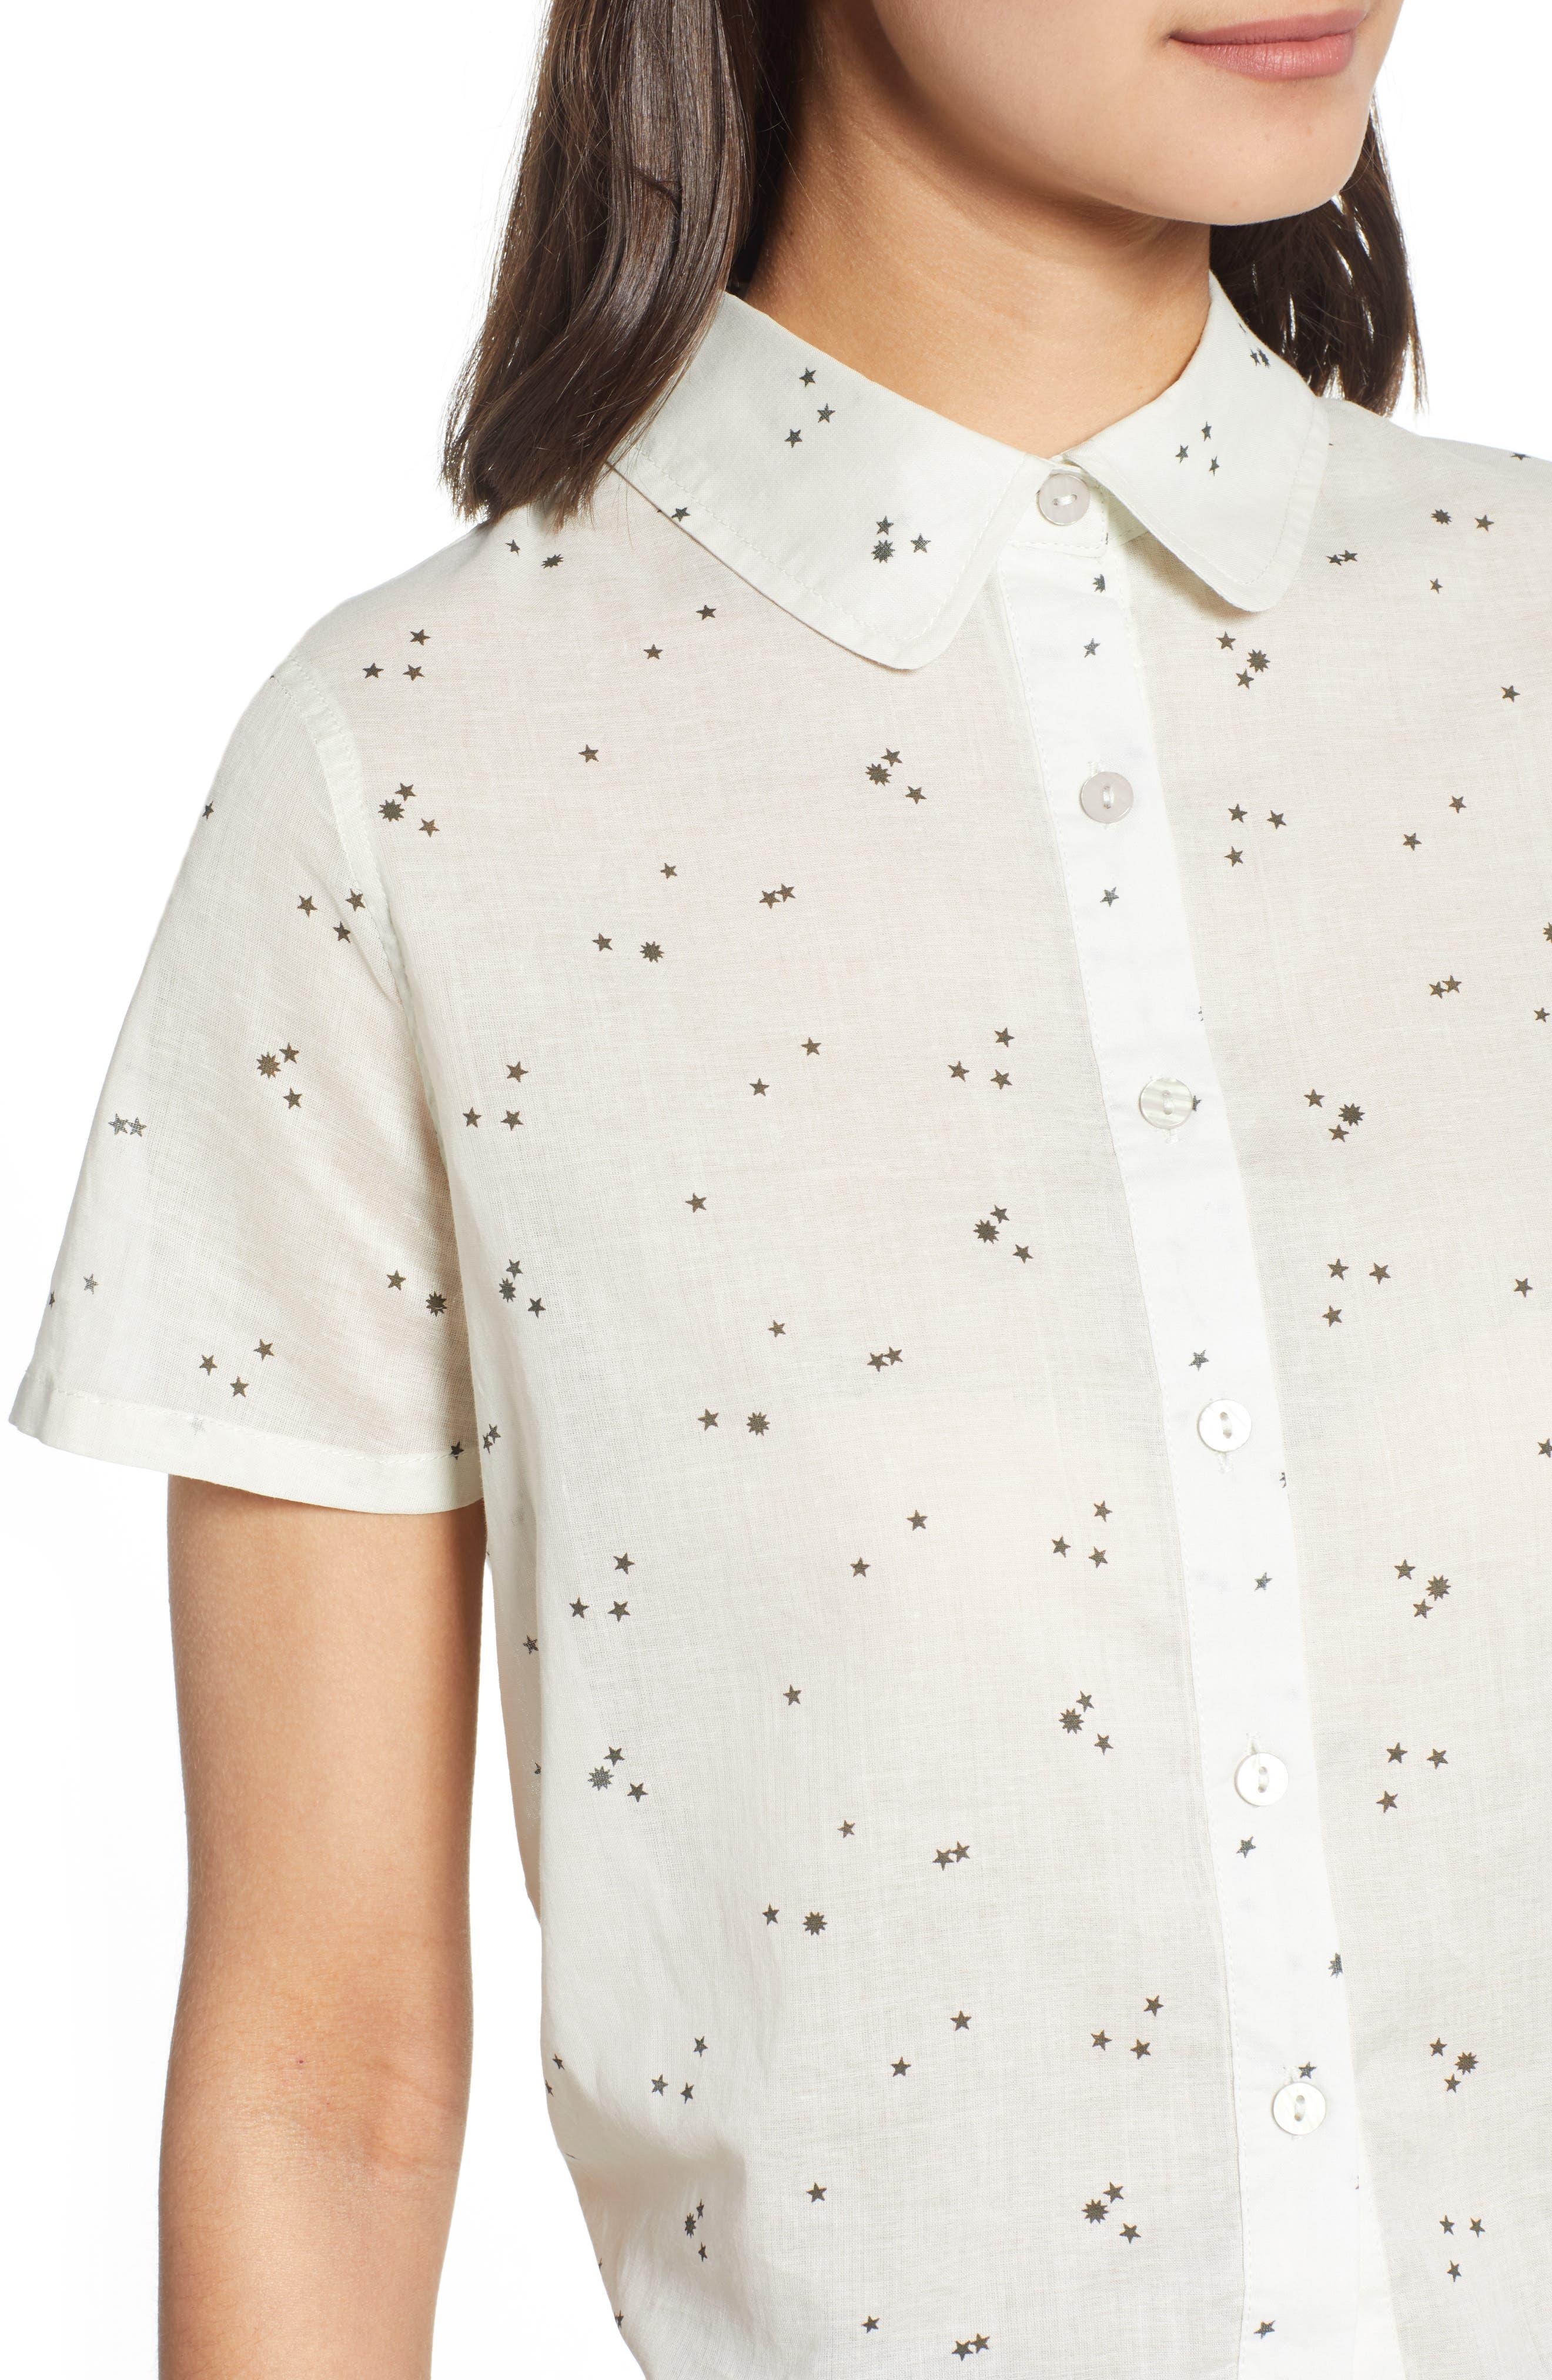 Tie Back Camp Shirt,                             Alternate thumbnail 4, color,                             White Star Print